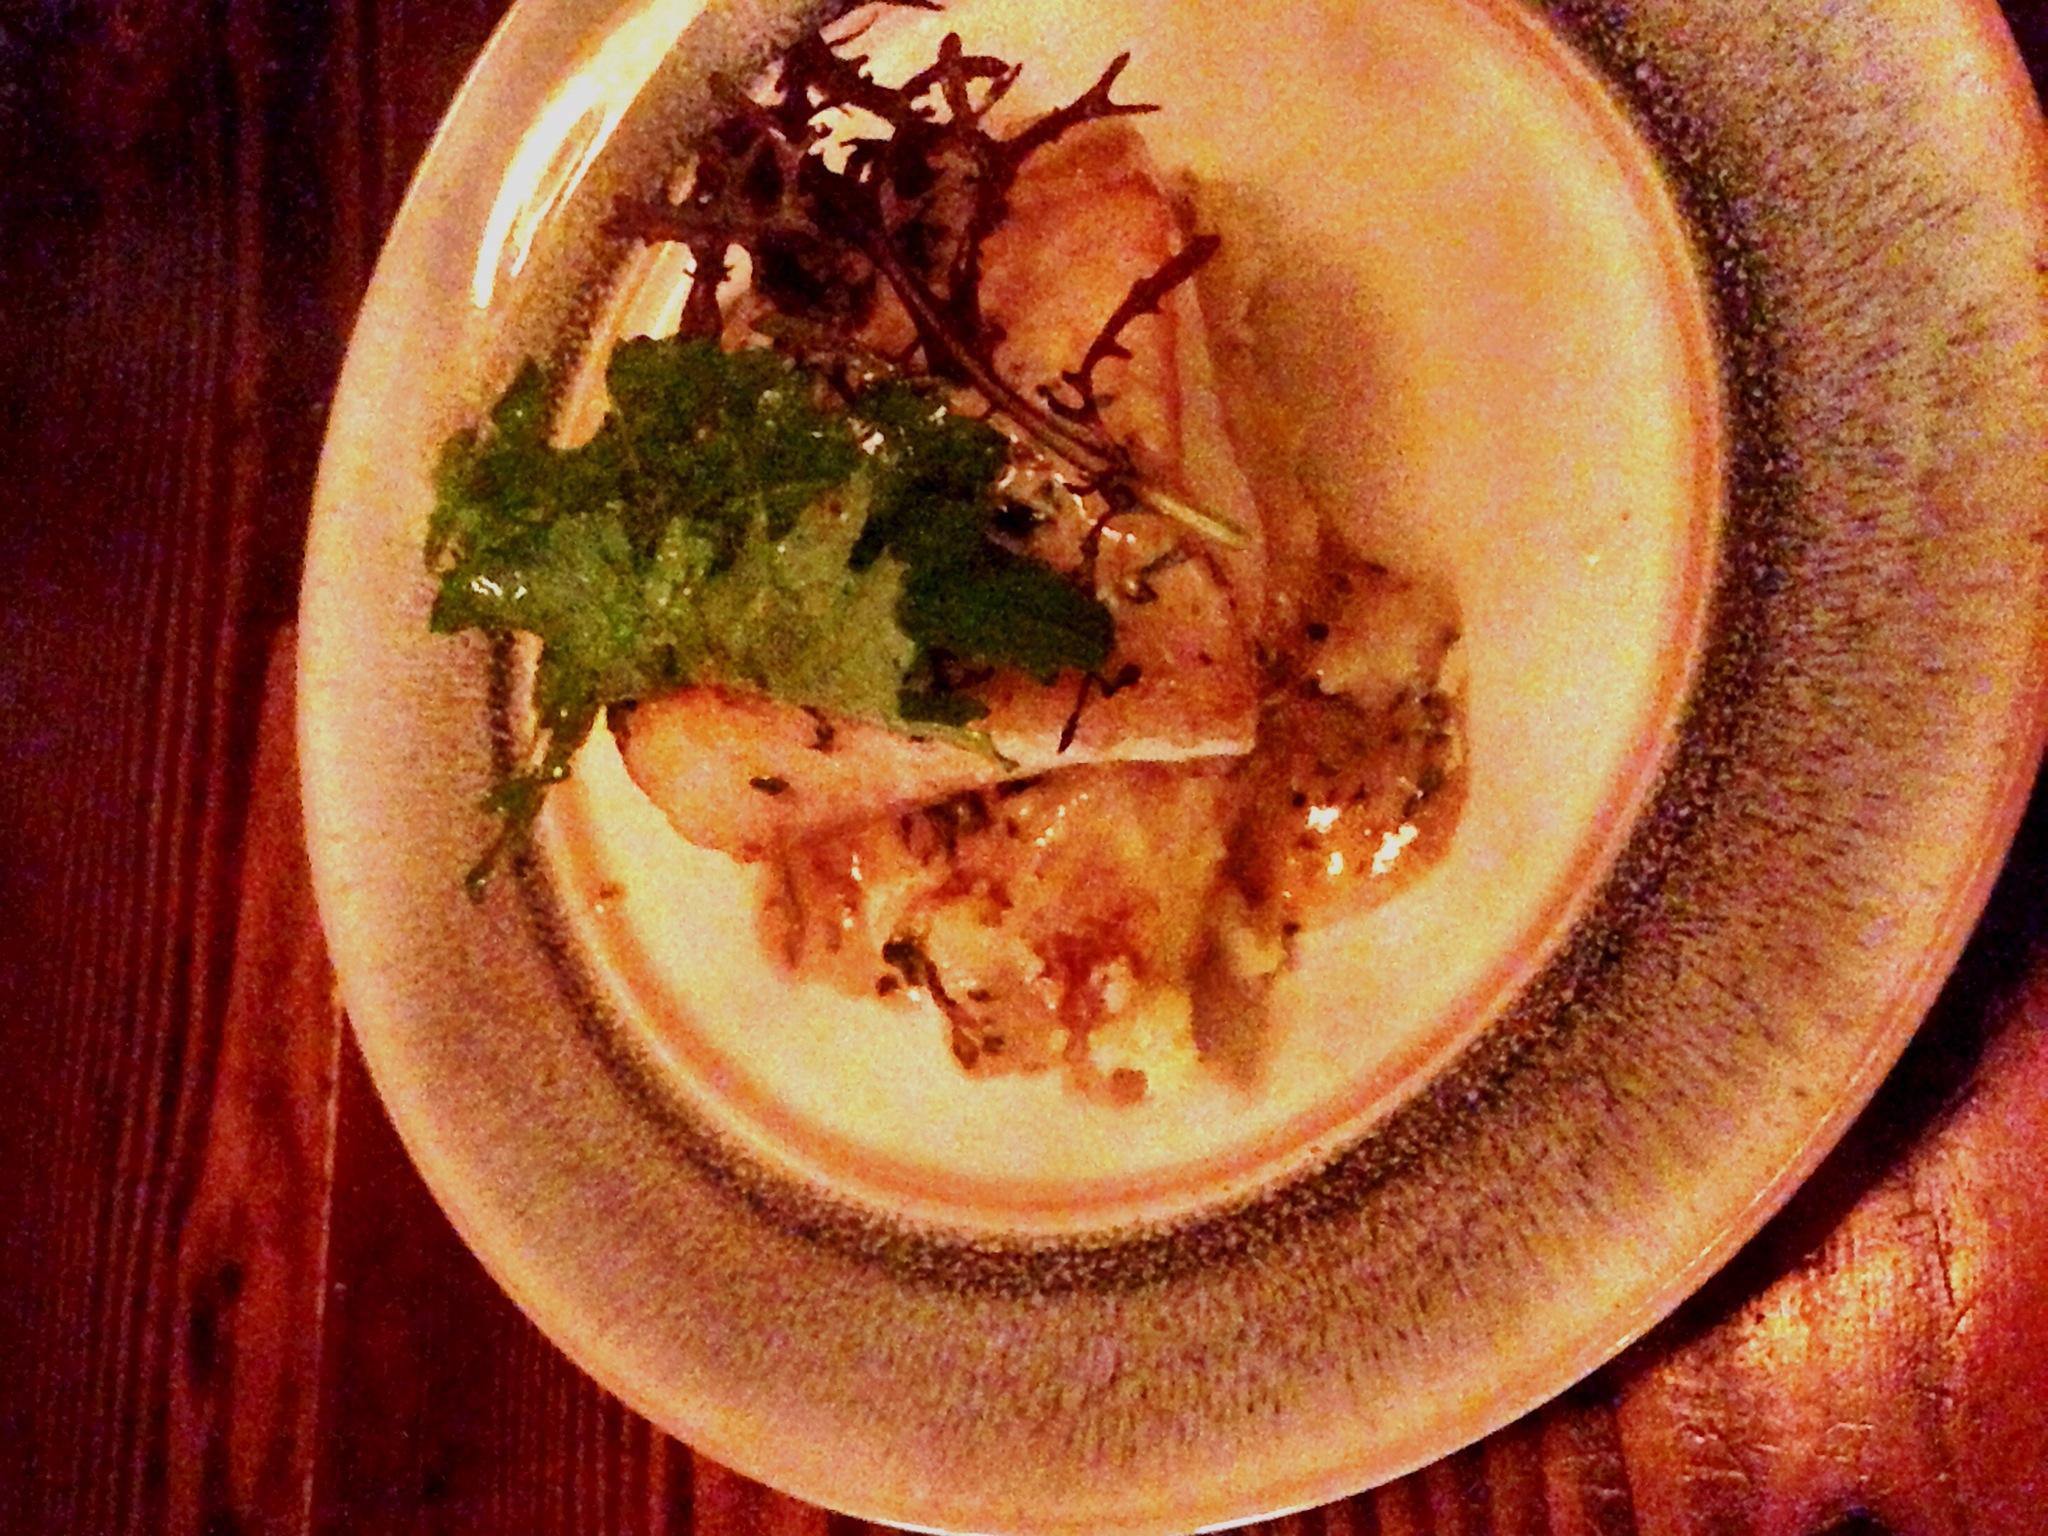 roasted sablefish, bagna cauda, Yukon gold potatoes